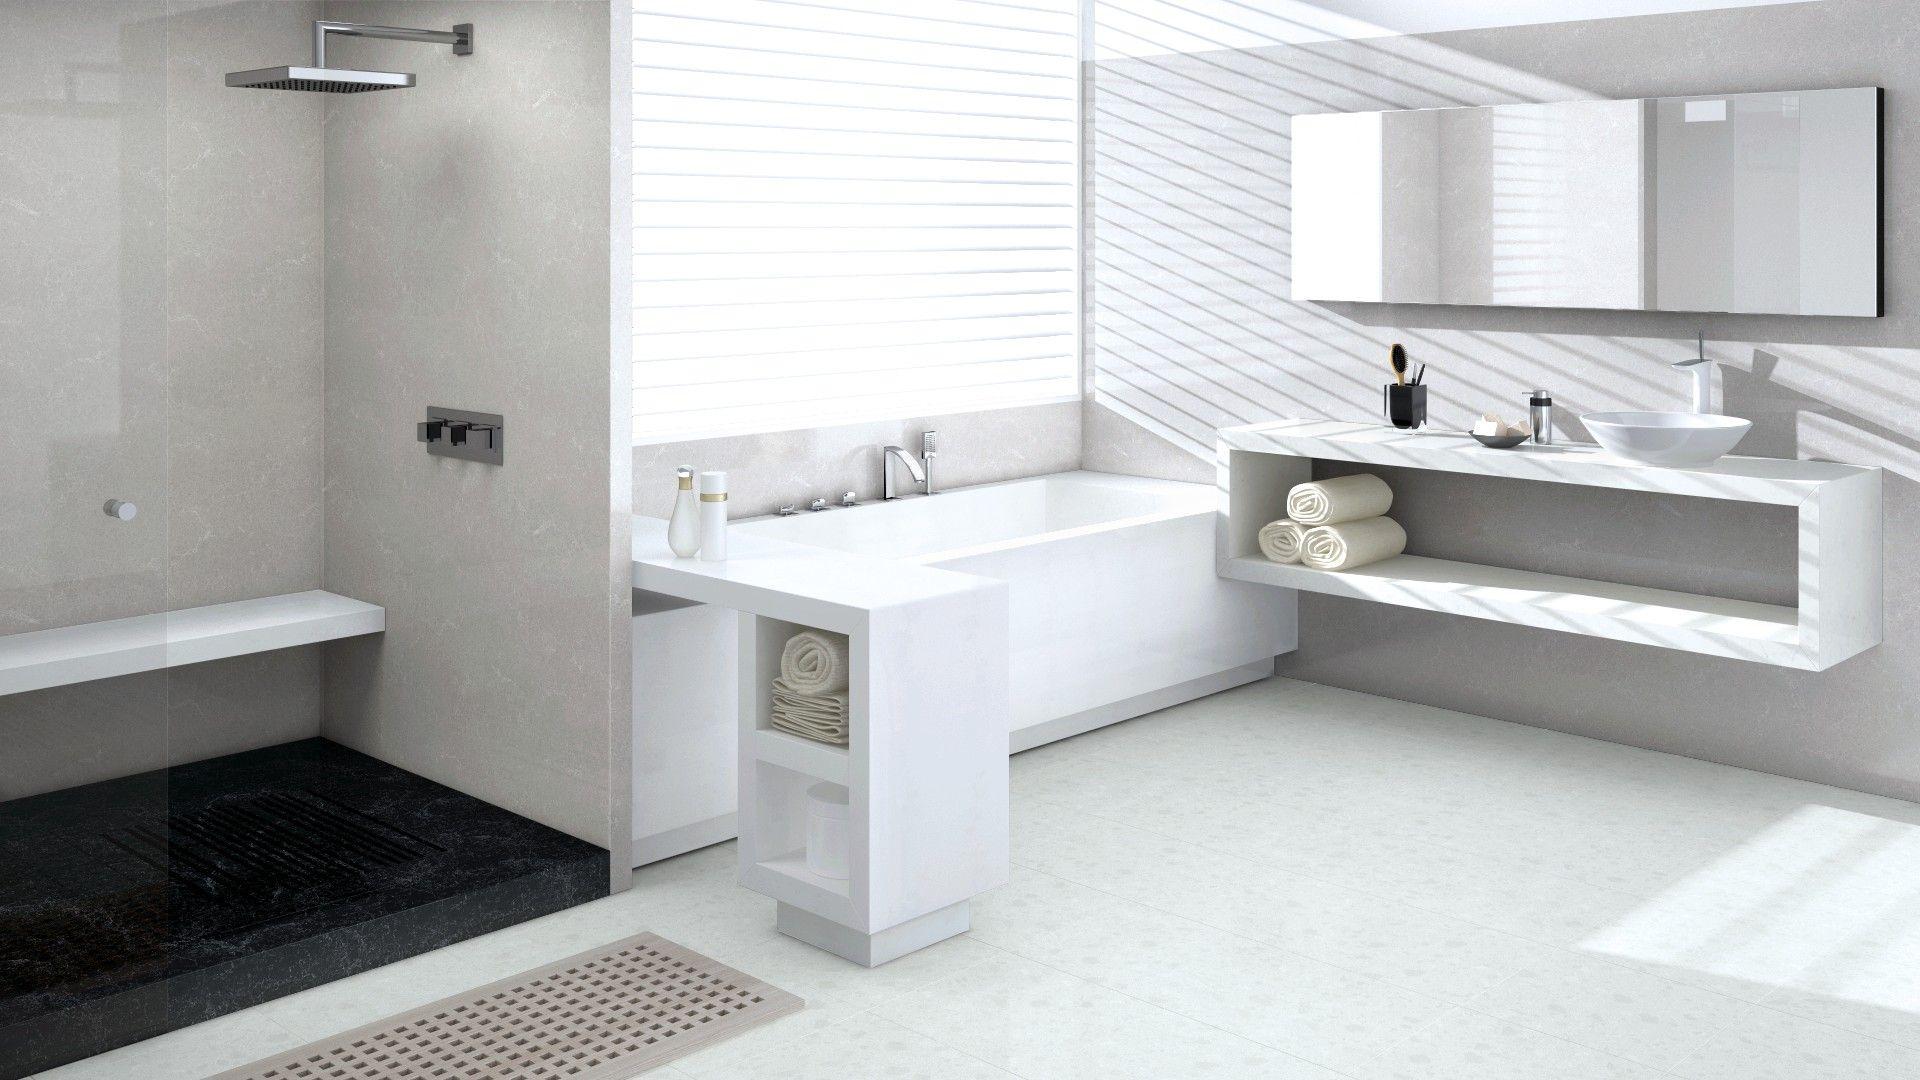 Caesarstone Visualizer | Home ideas :) | Pinterest | Pure white ...